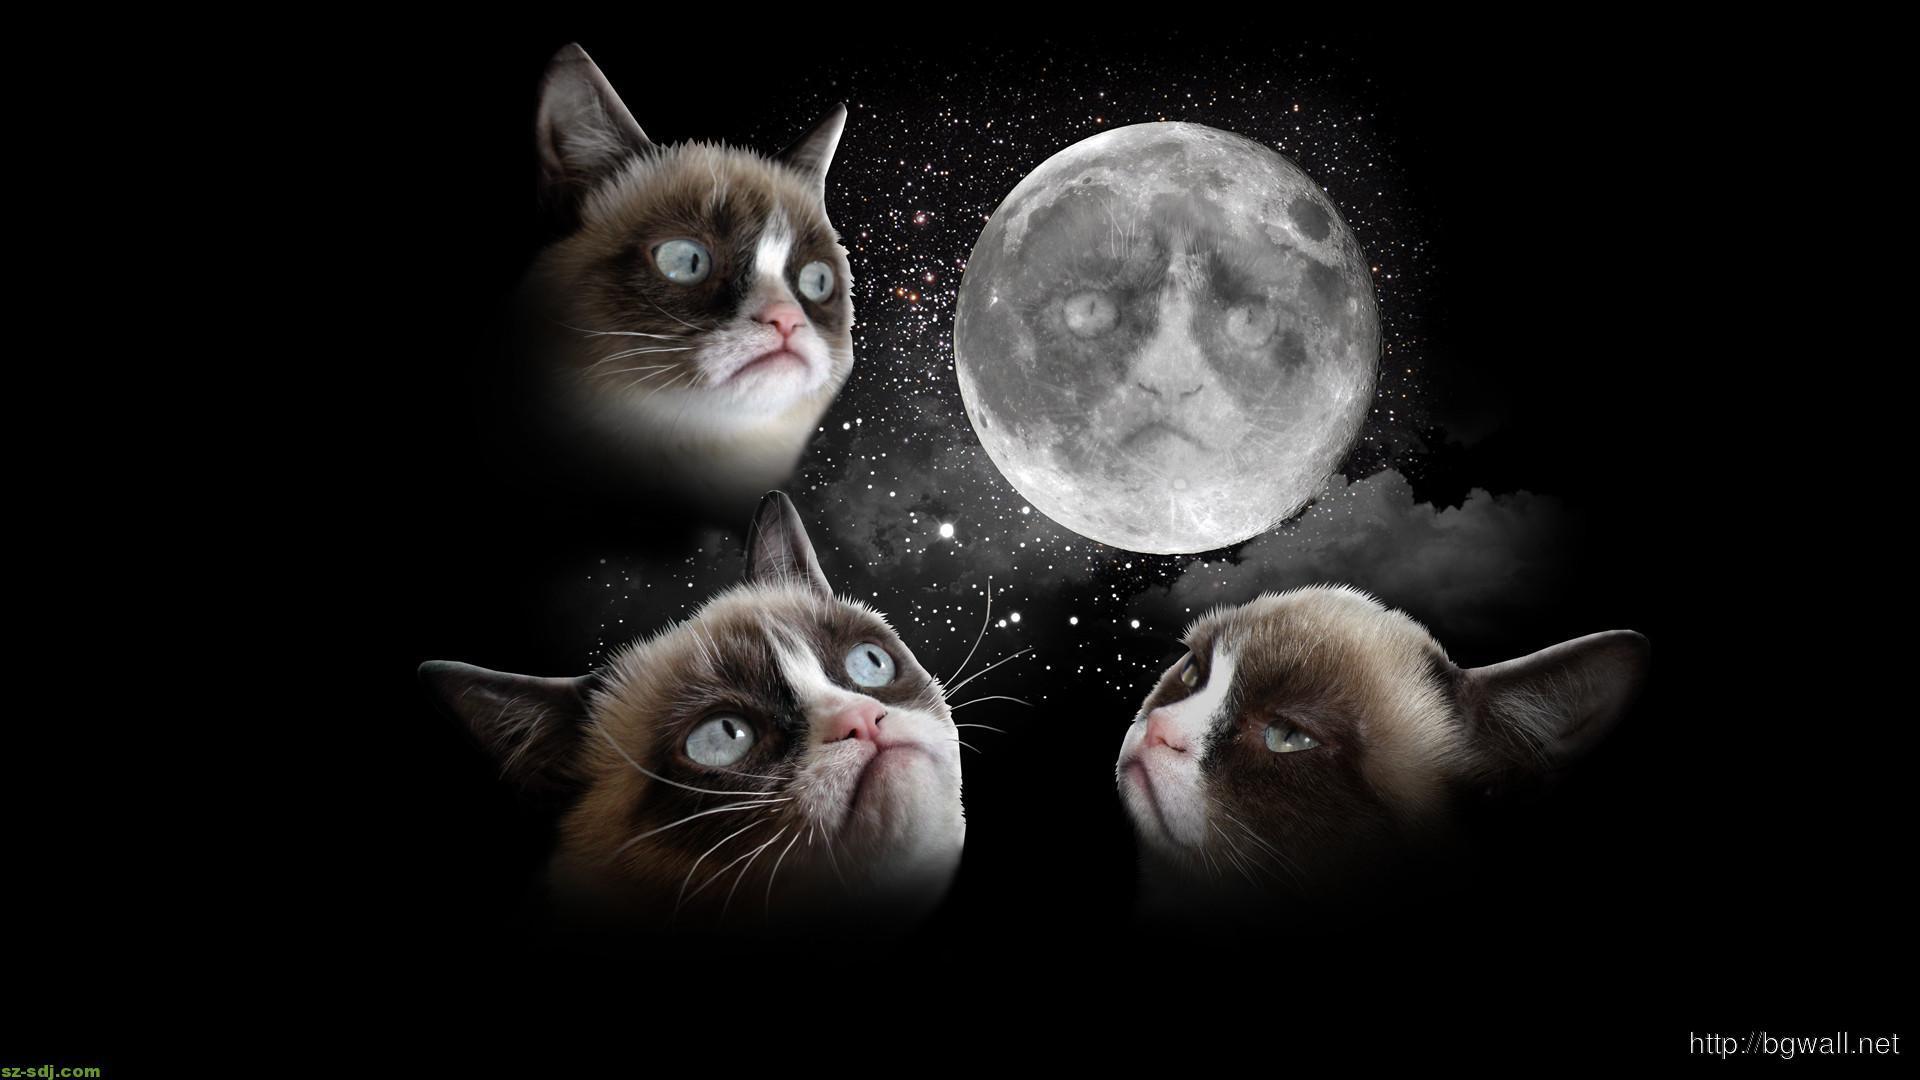 grumpy-cat-dreaming-to-the-grumpy-moon-wallpaper-pc